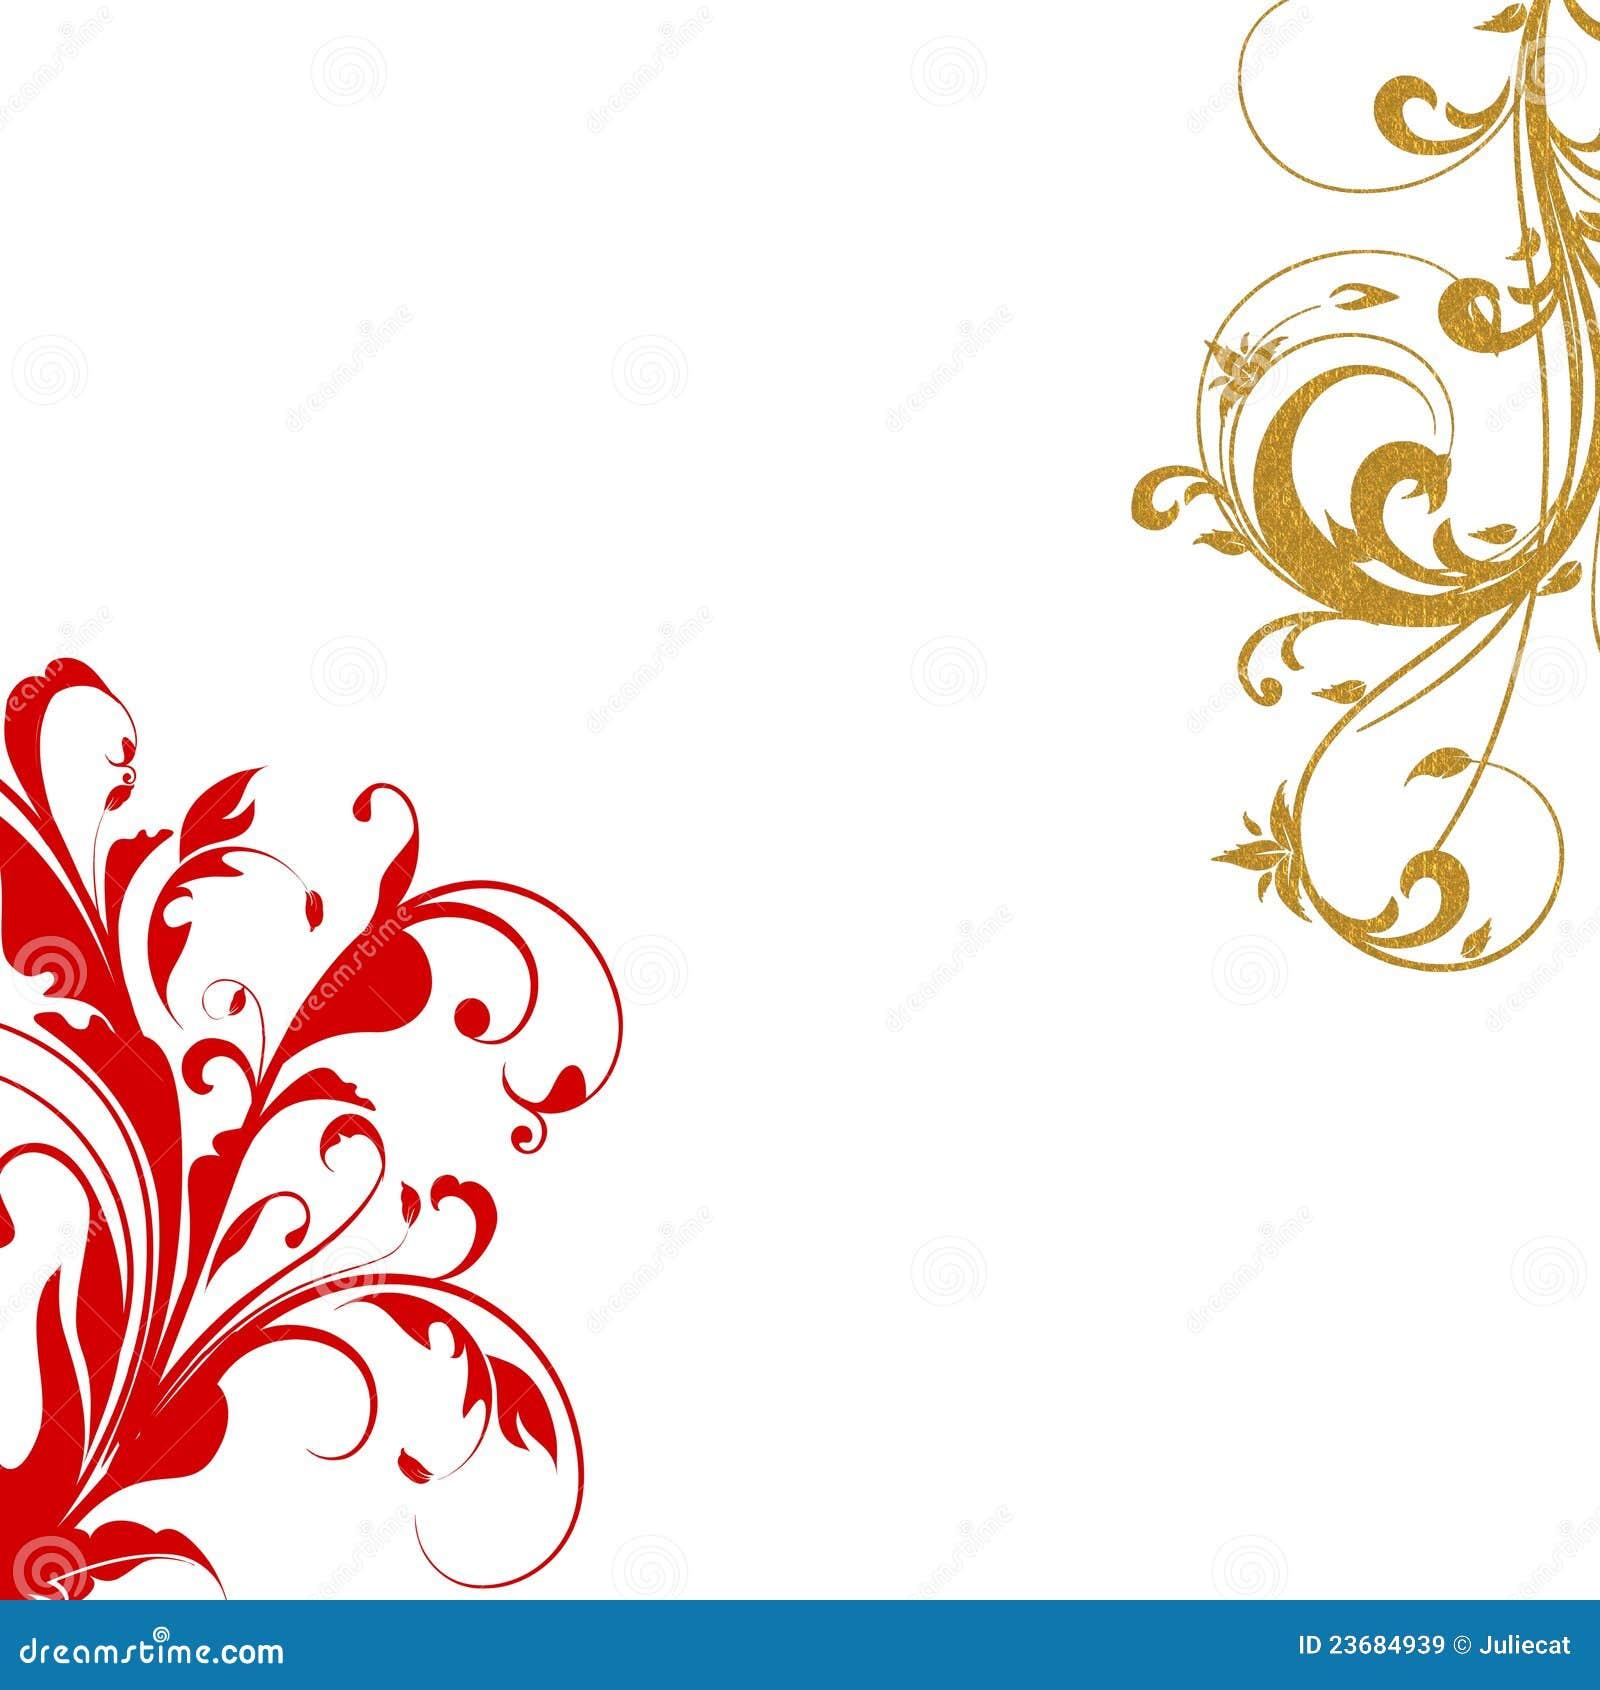 Red gold flourish swirls